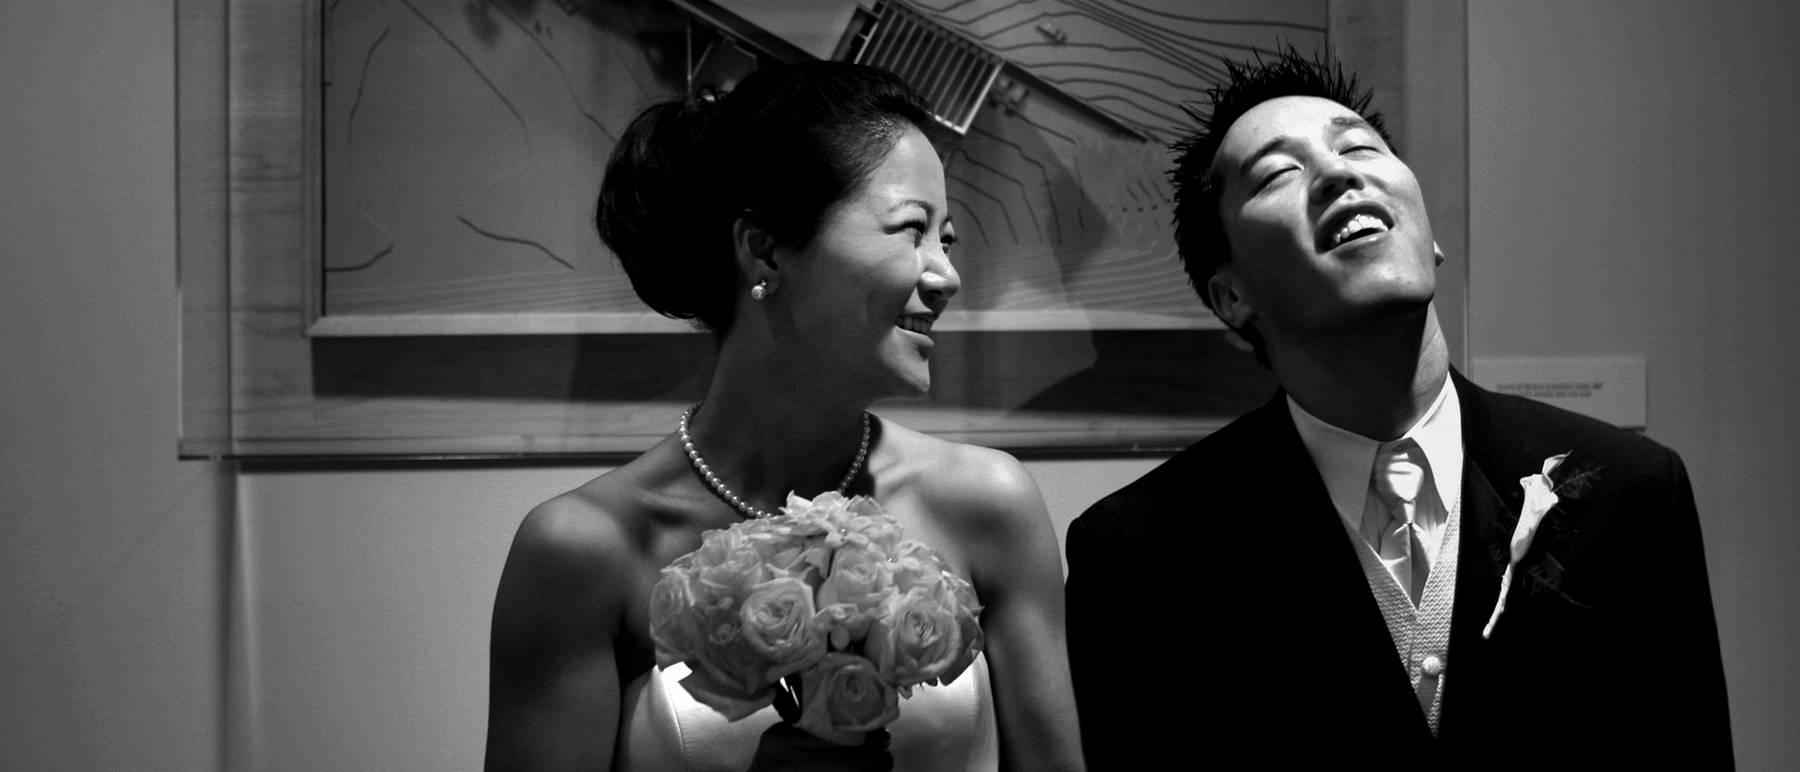 johnandjoseph-wedding-photographer-hz-slider-373